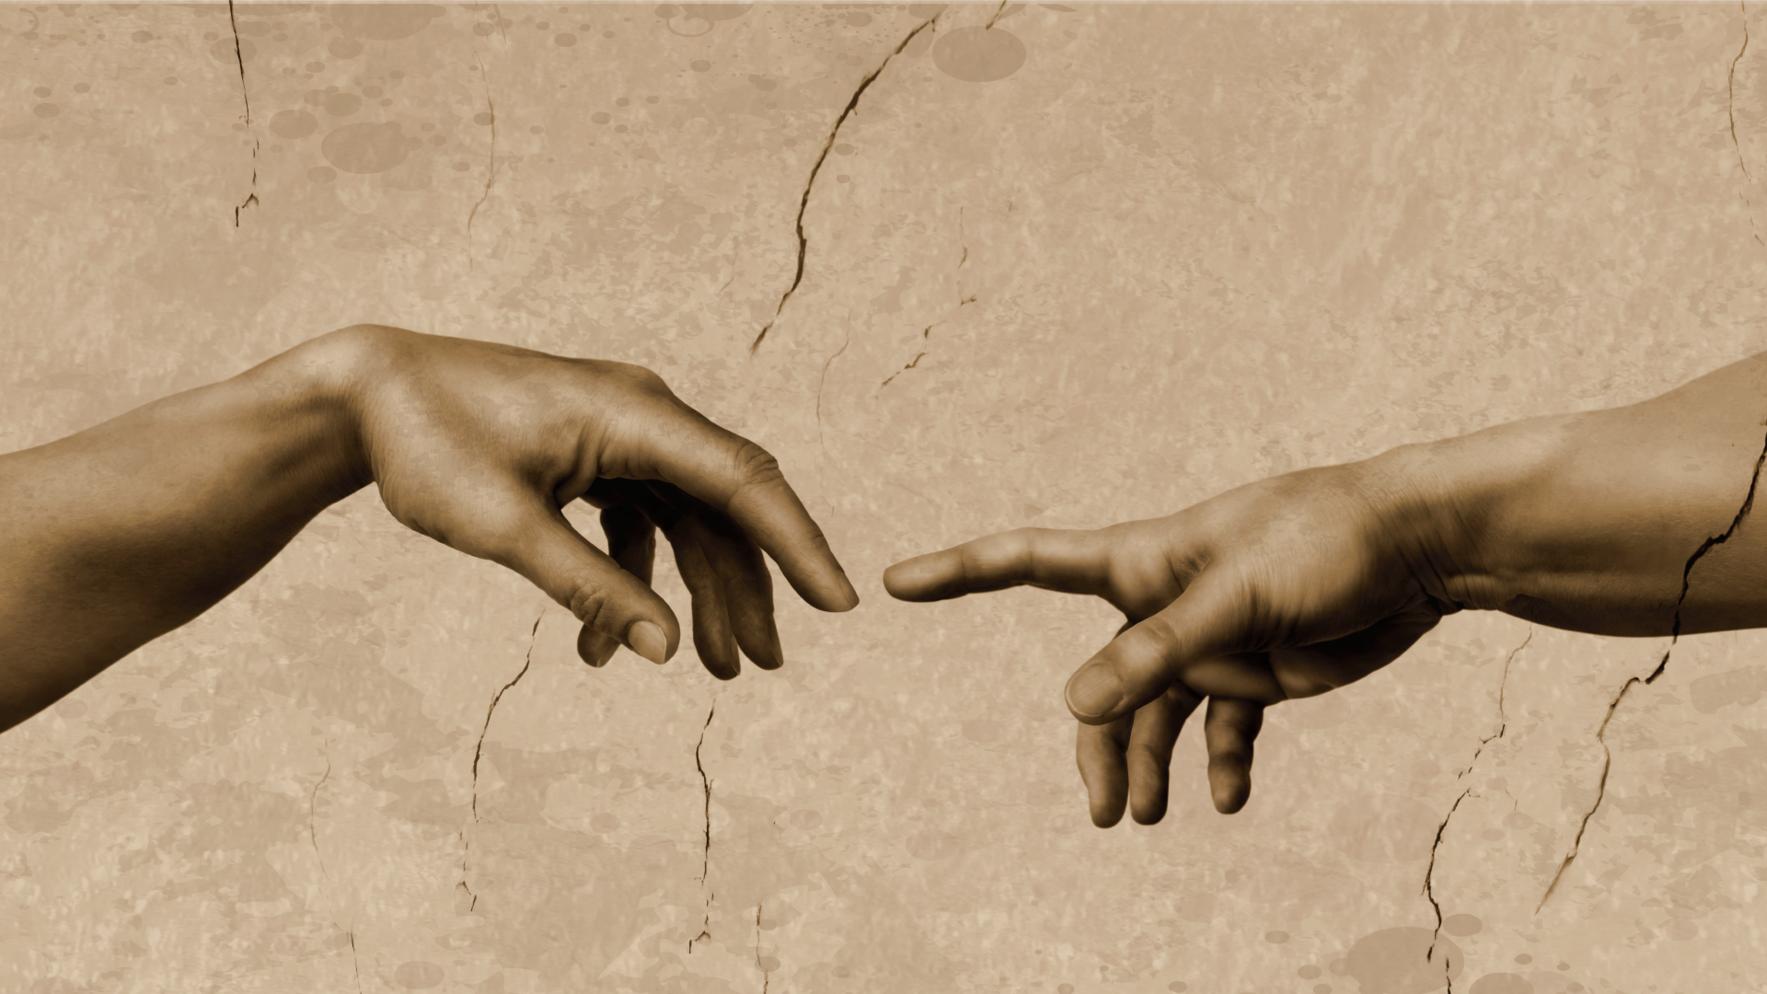 руки тянутся друг к другу картинки без фона таким уголком сами